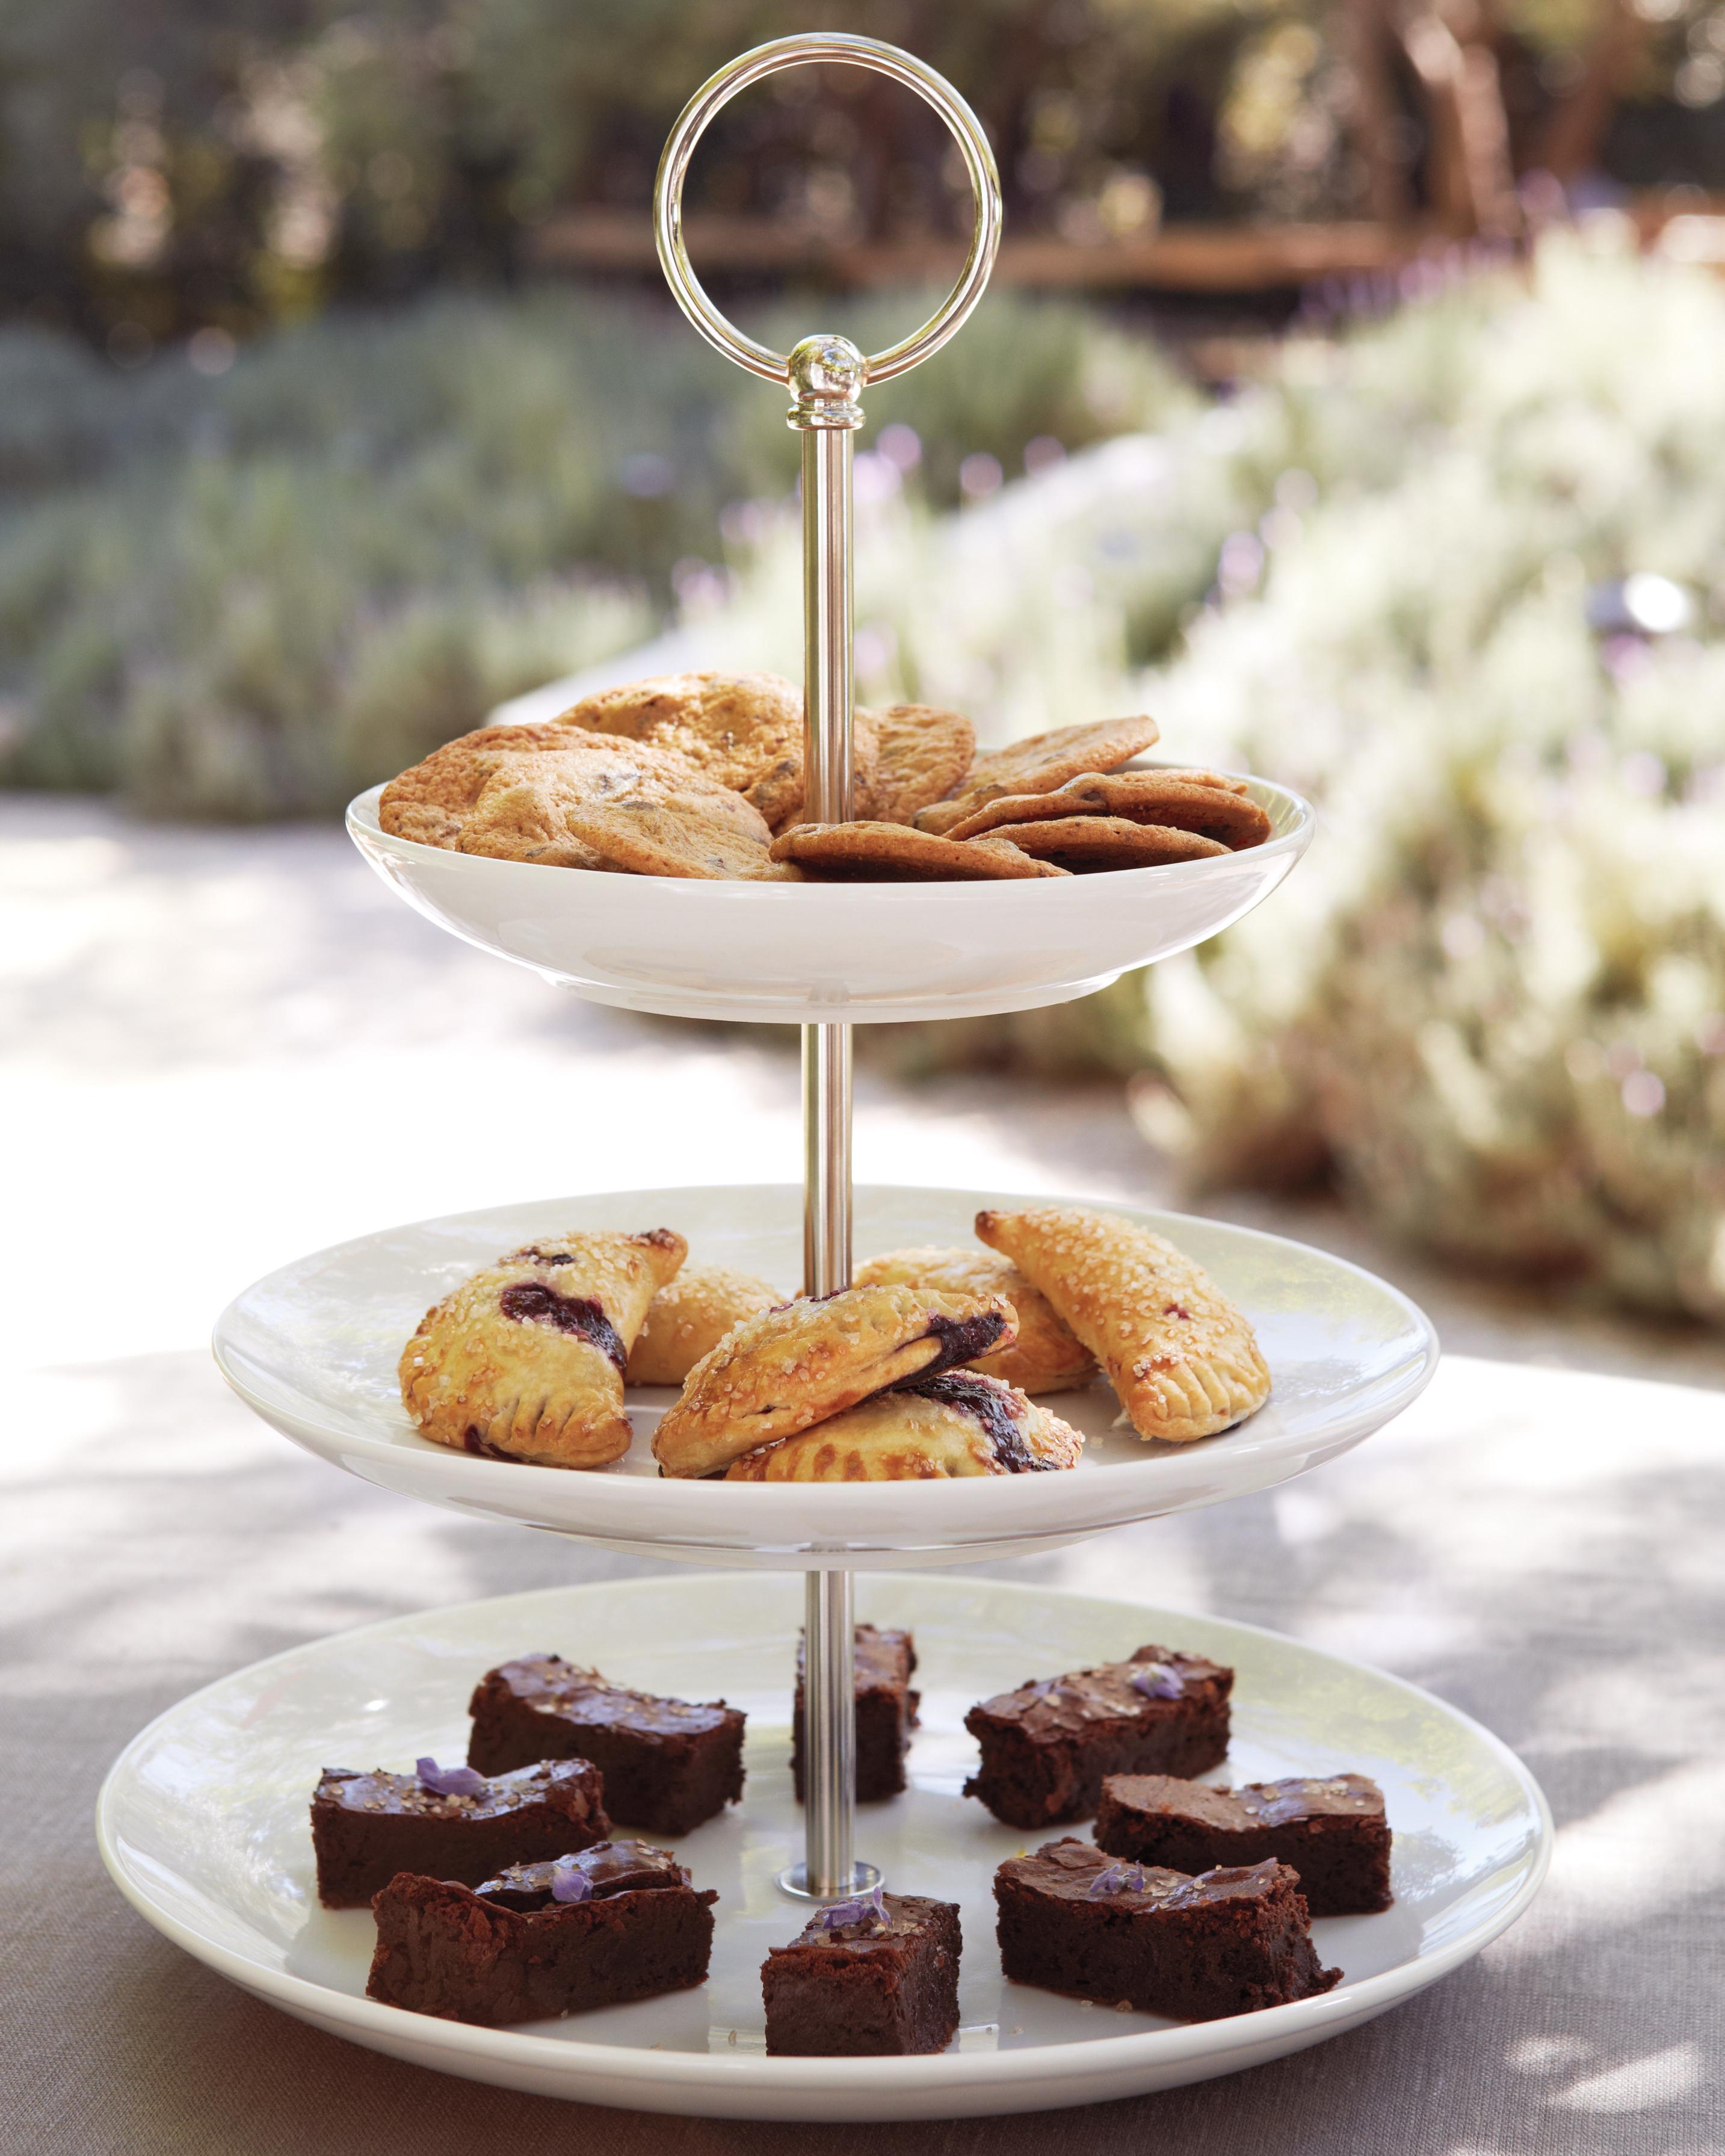 desserts-mwd109296.jpg